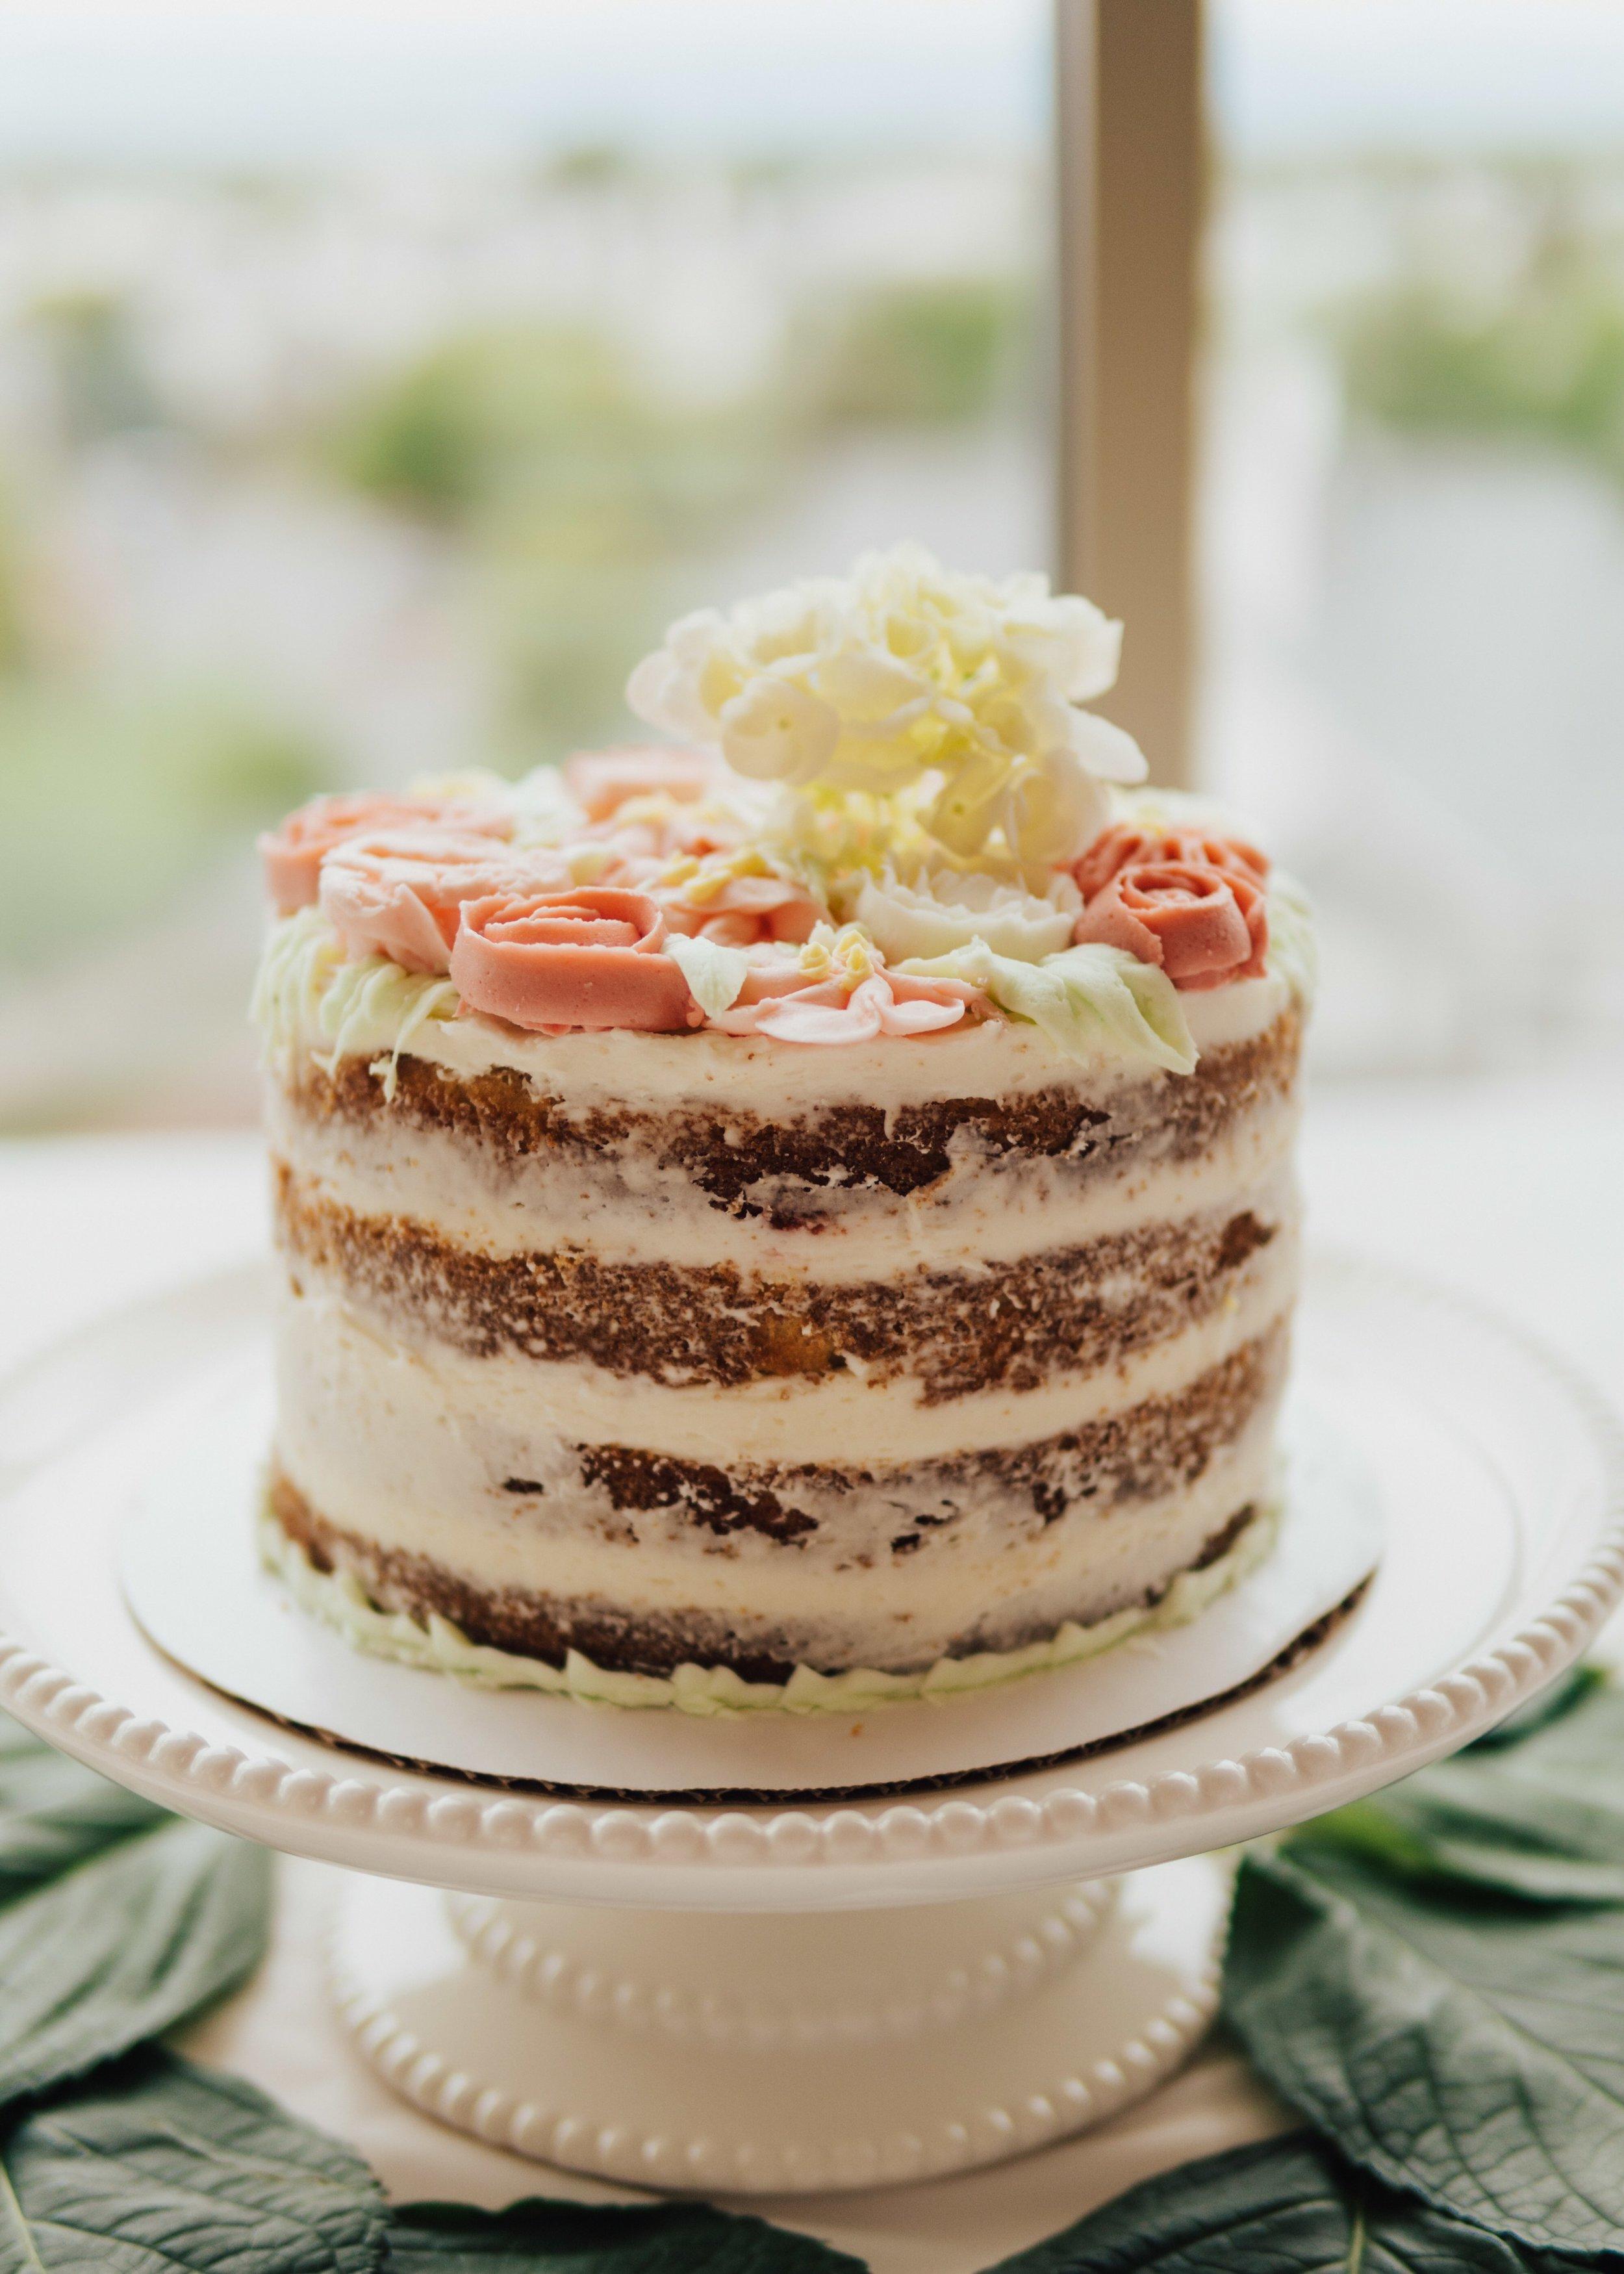 About the baker - Denver, CO